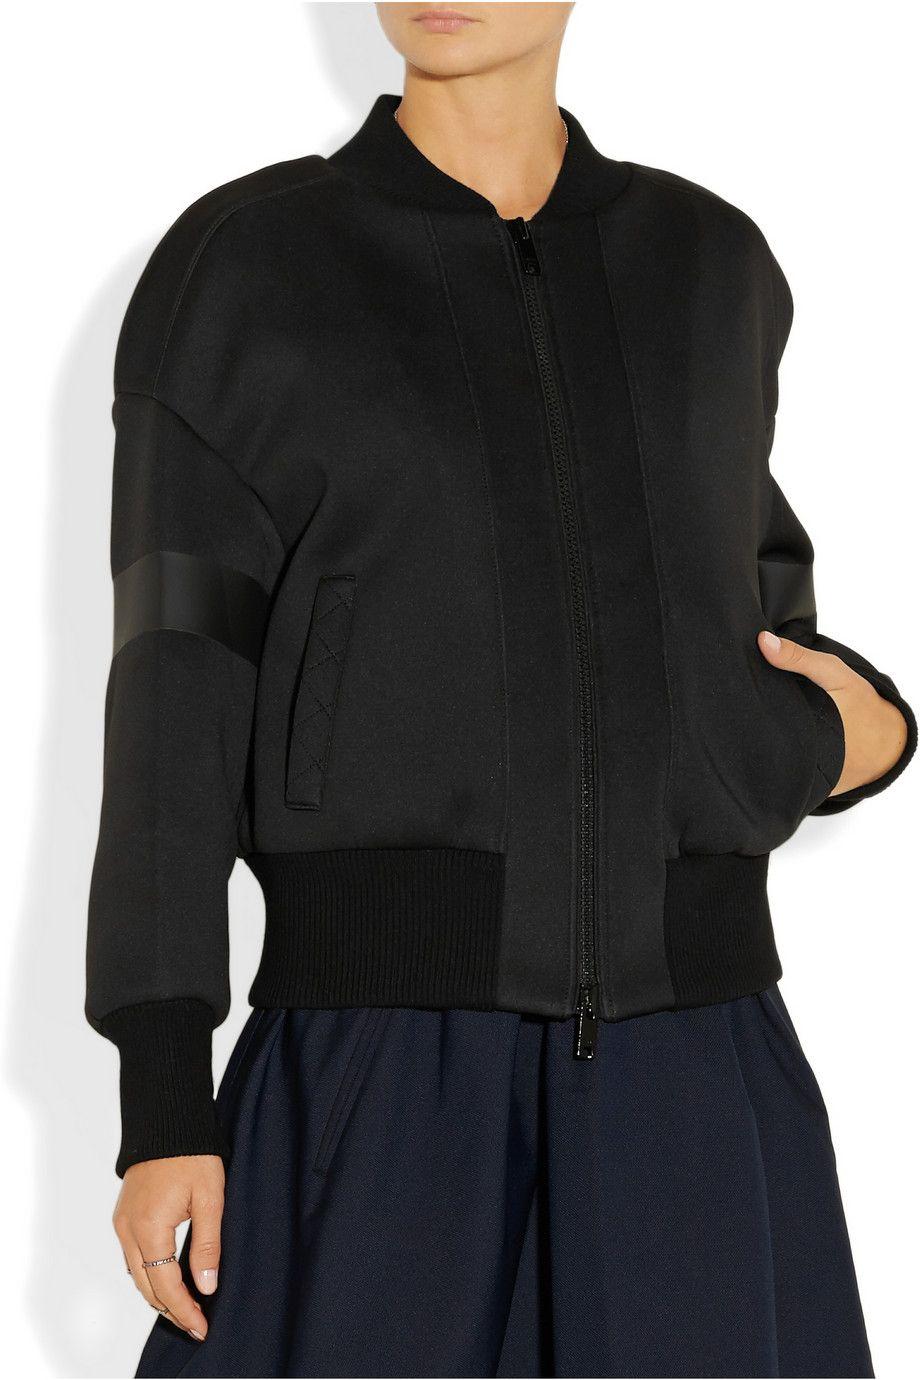 DKNYNeoprene bomber jacketfront   Wish List/Shopping List ...